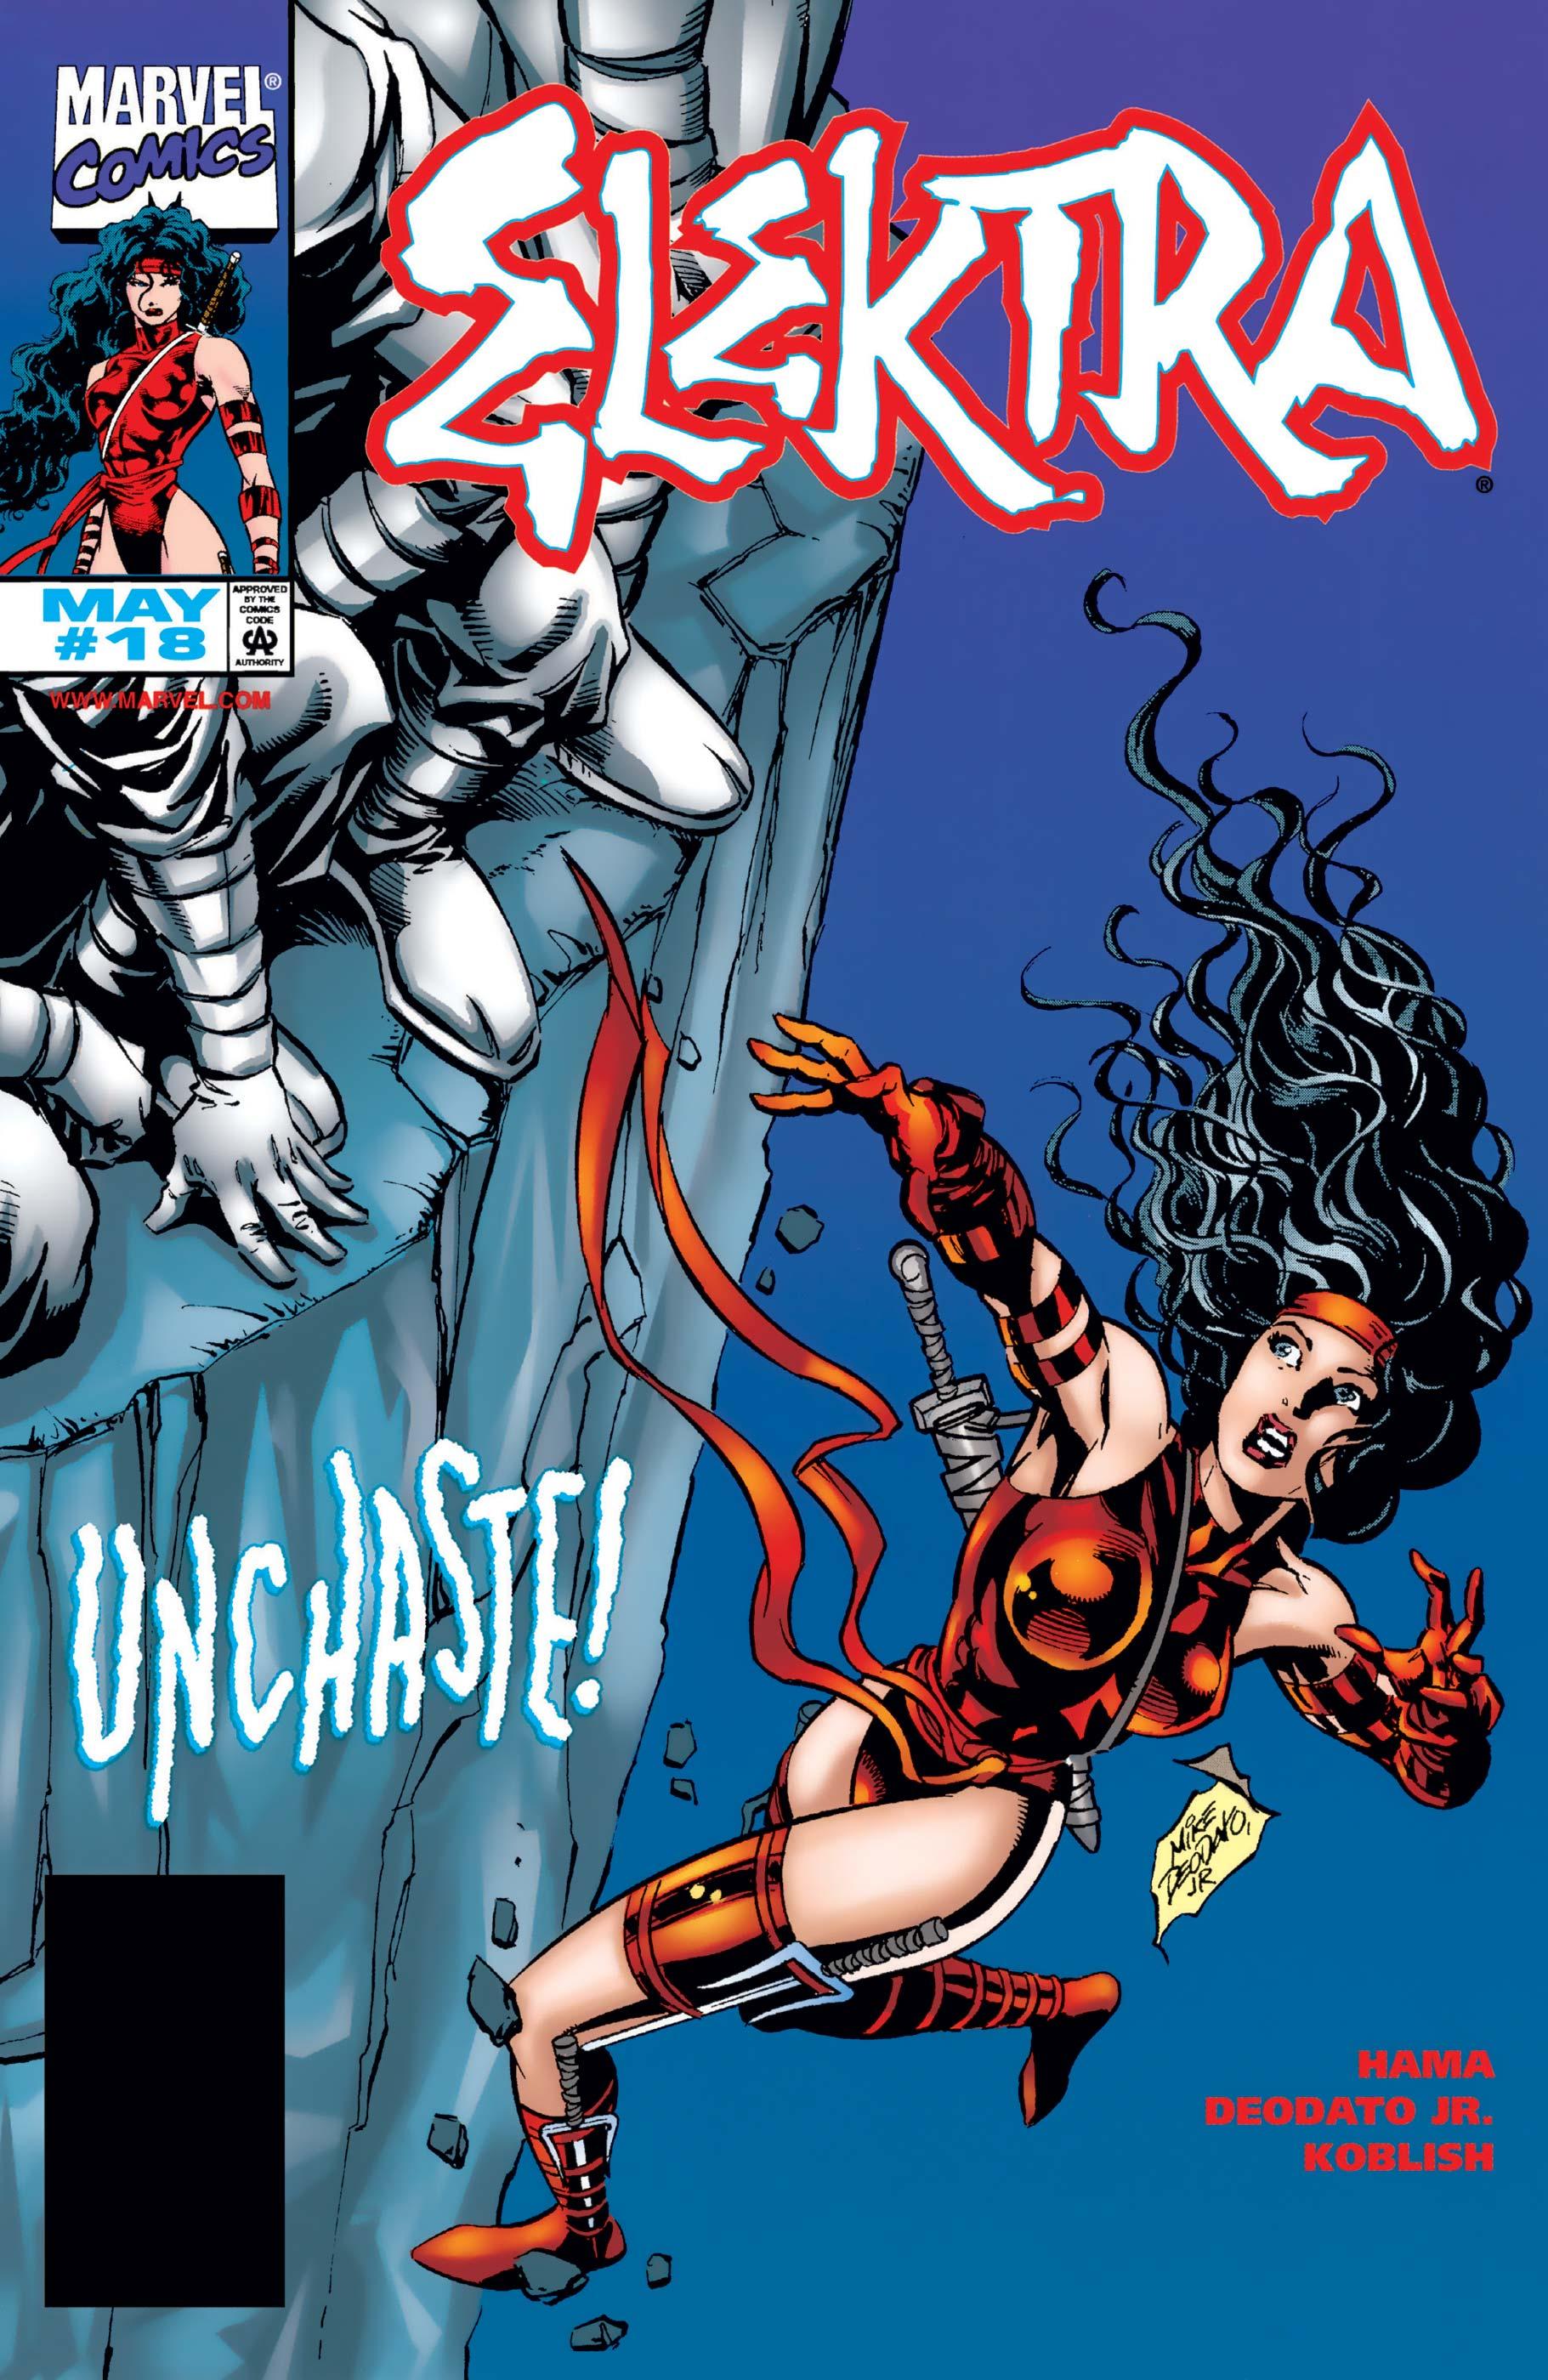 Elektra (1996) #18